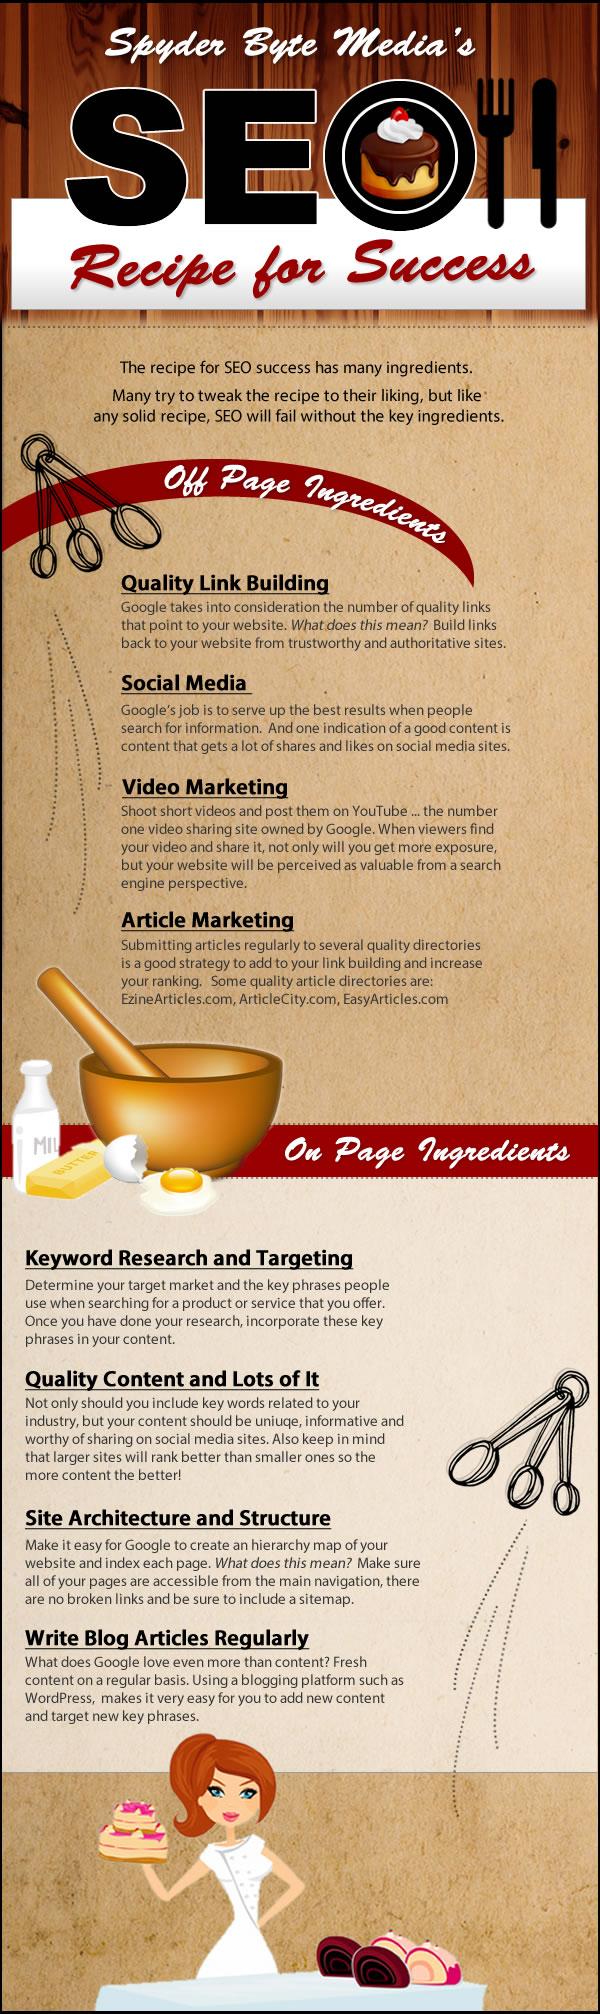 Spyder Byte Media's SEO Recipe for Success